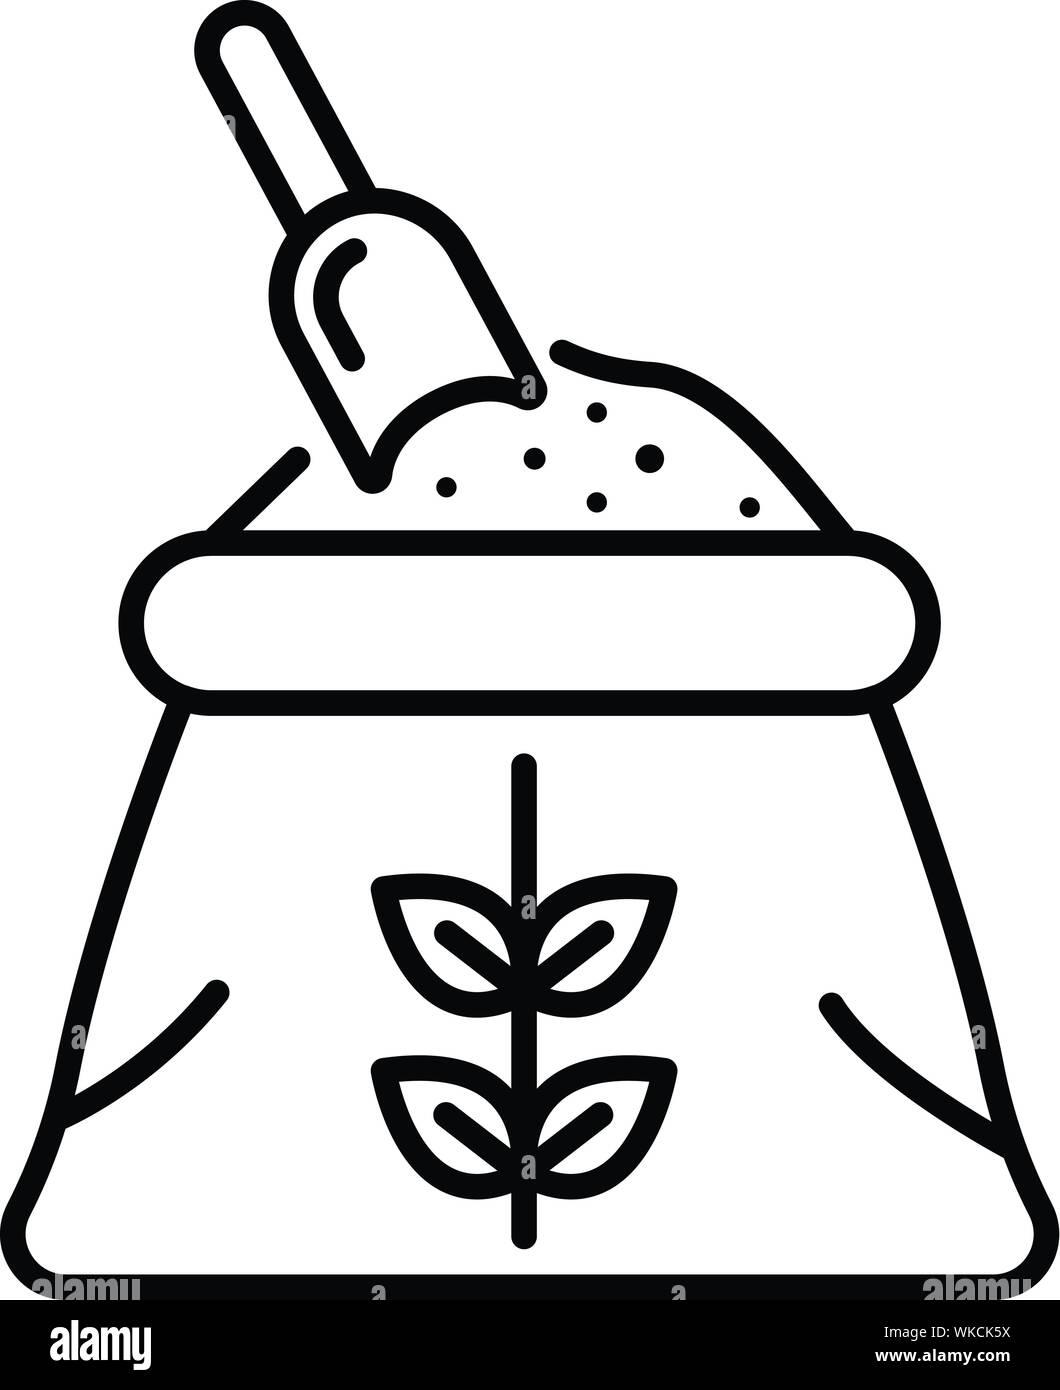 flour sack icon outline style stock vector image art alamy https www alamy com flour sack icon outline style image270112470 html